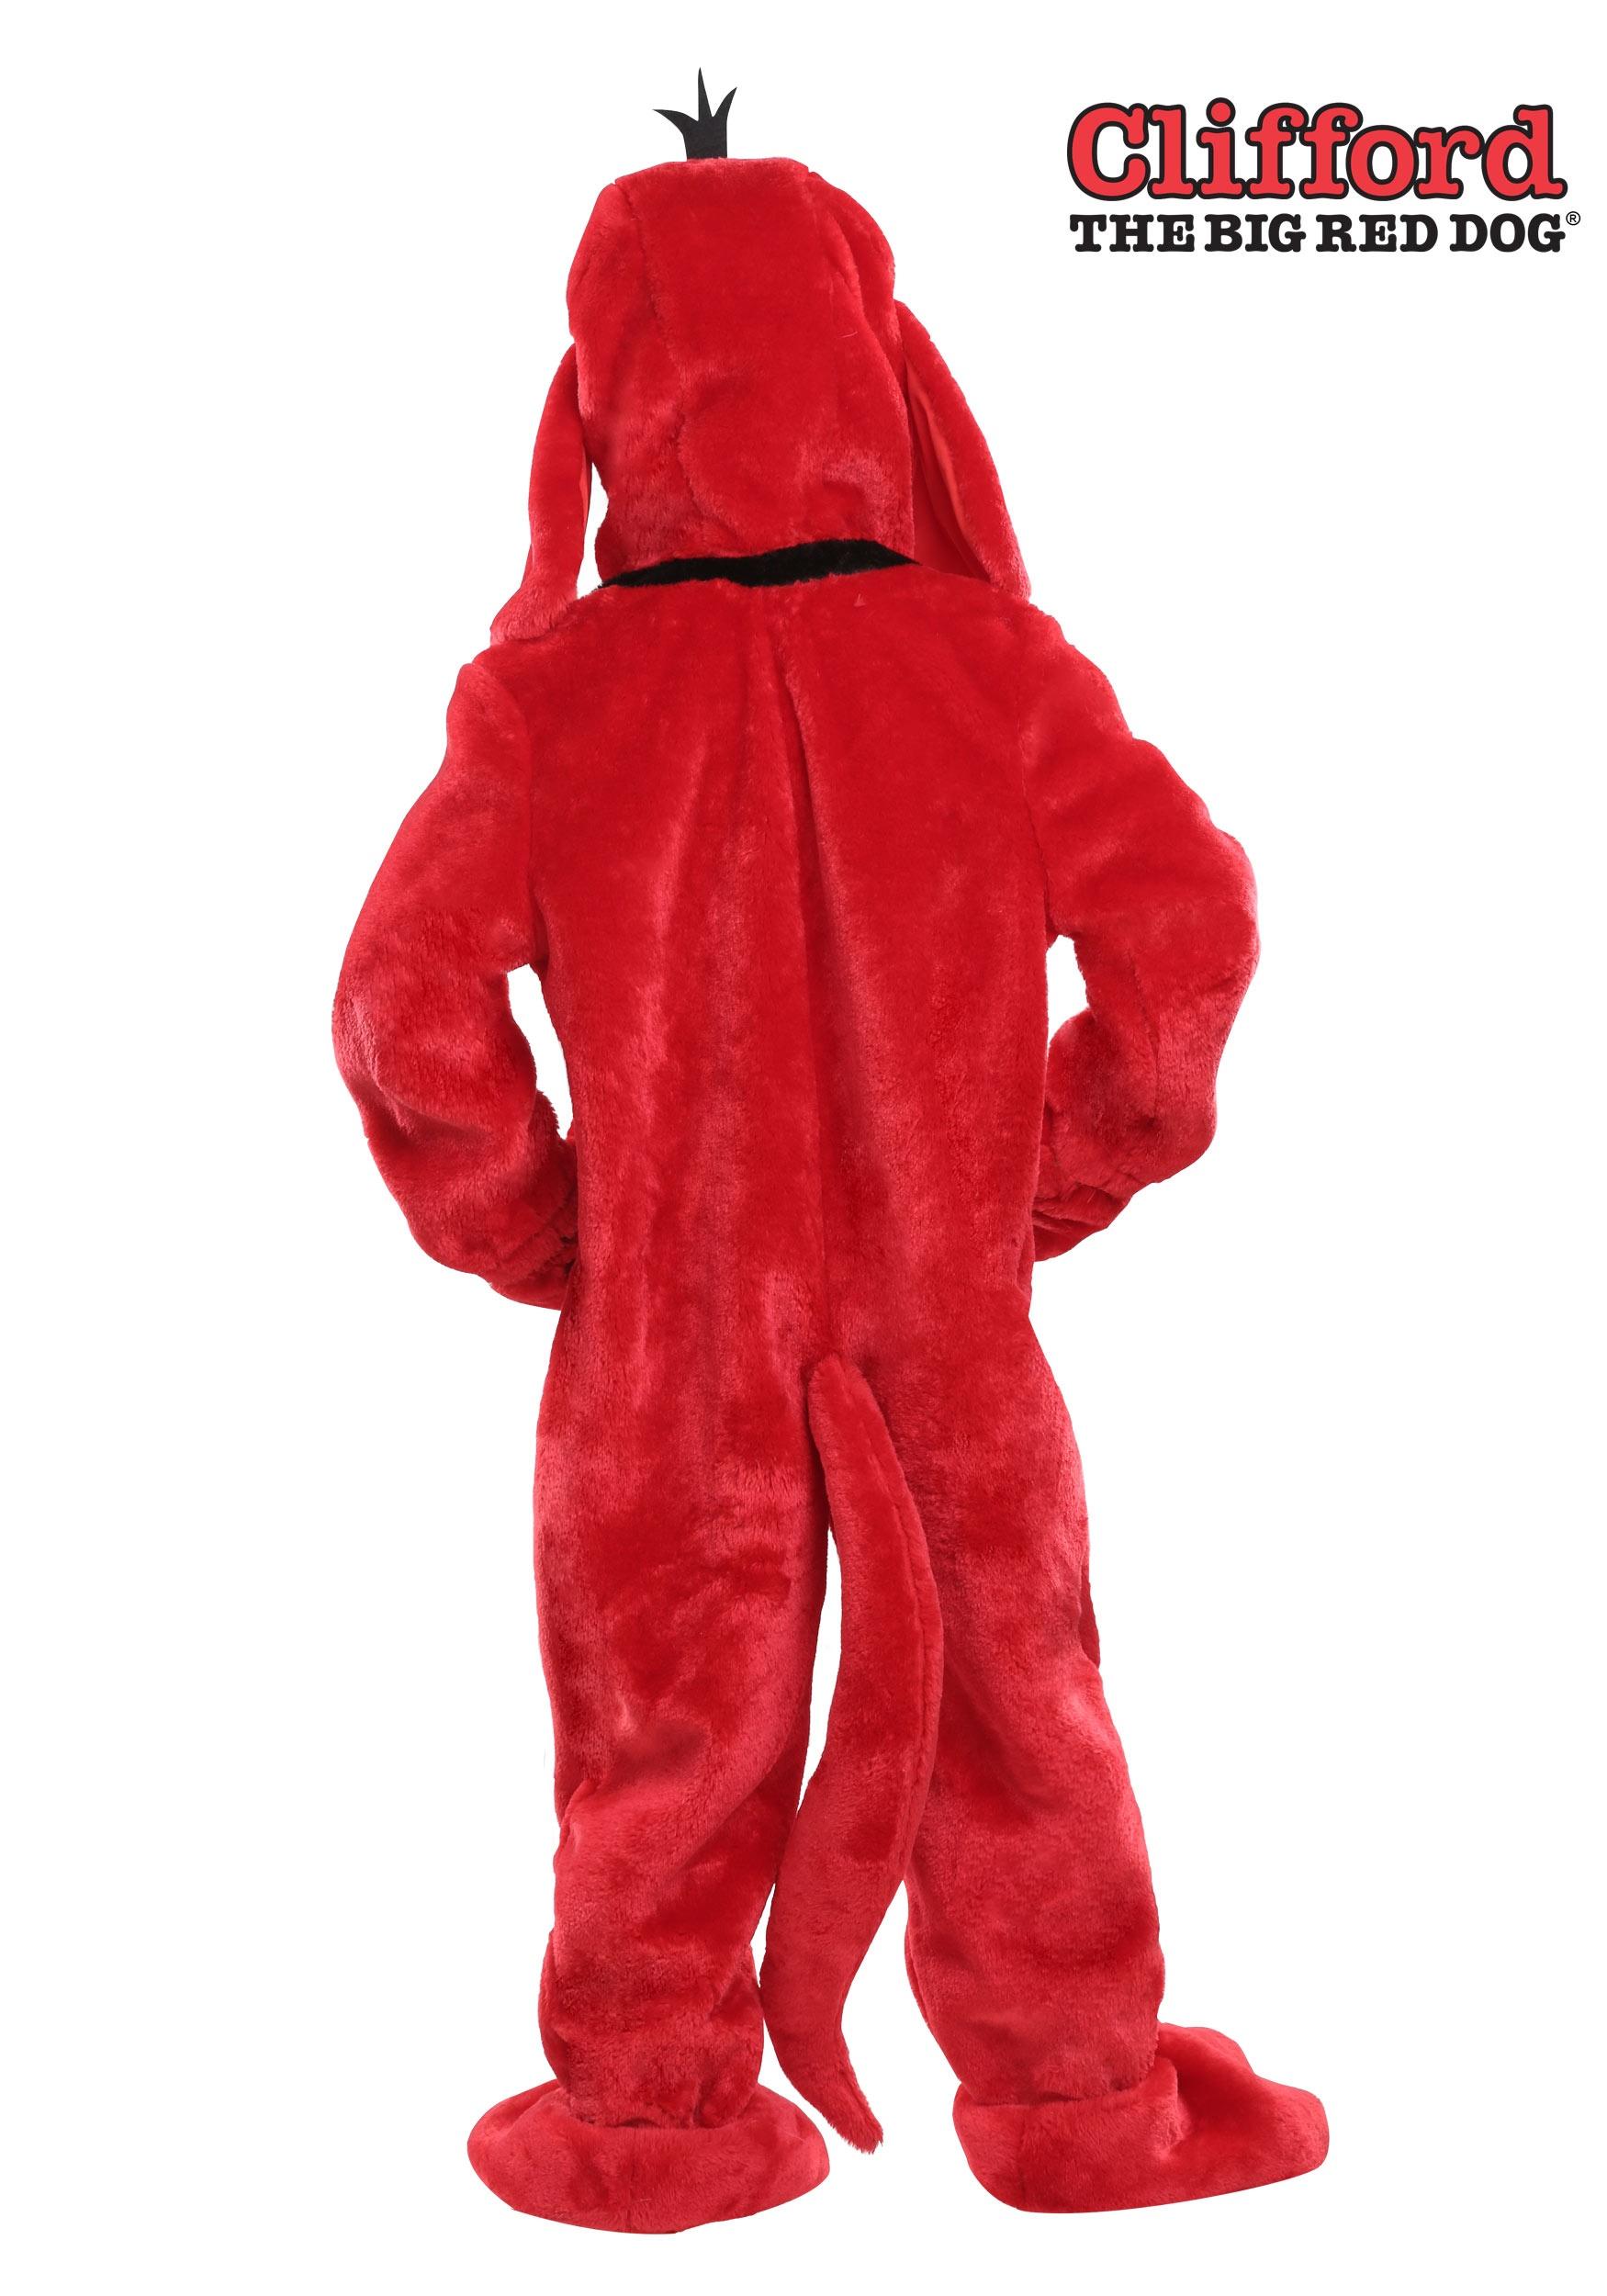 a61a5a7d712 Clifford the Big Red Dog Children s Costume-alt2